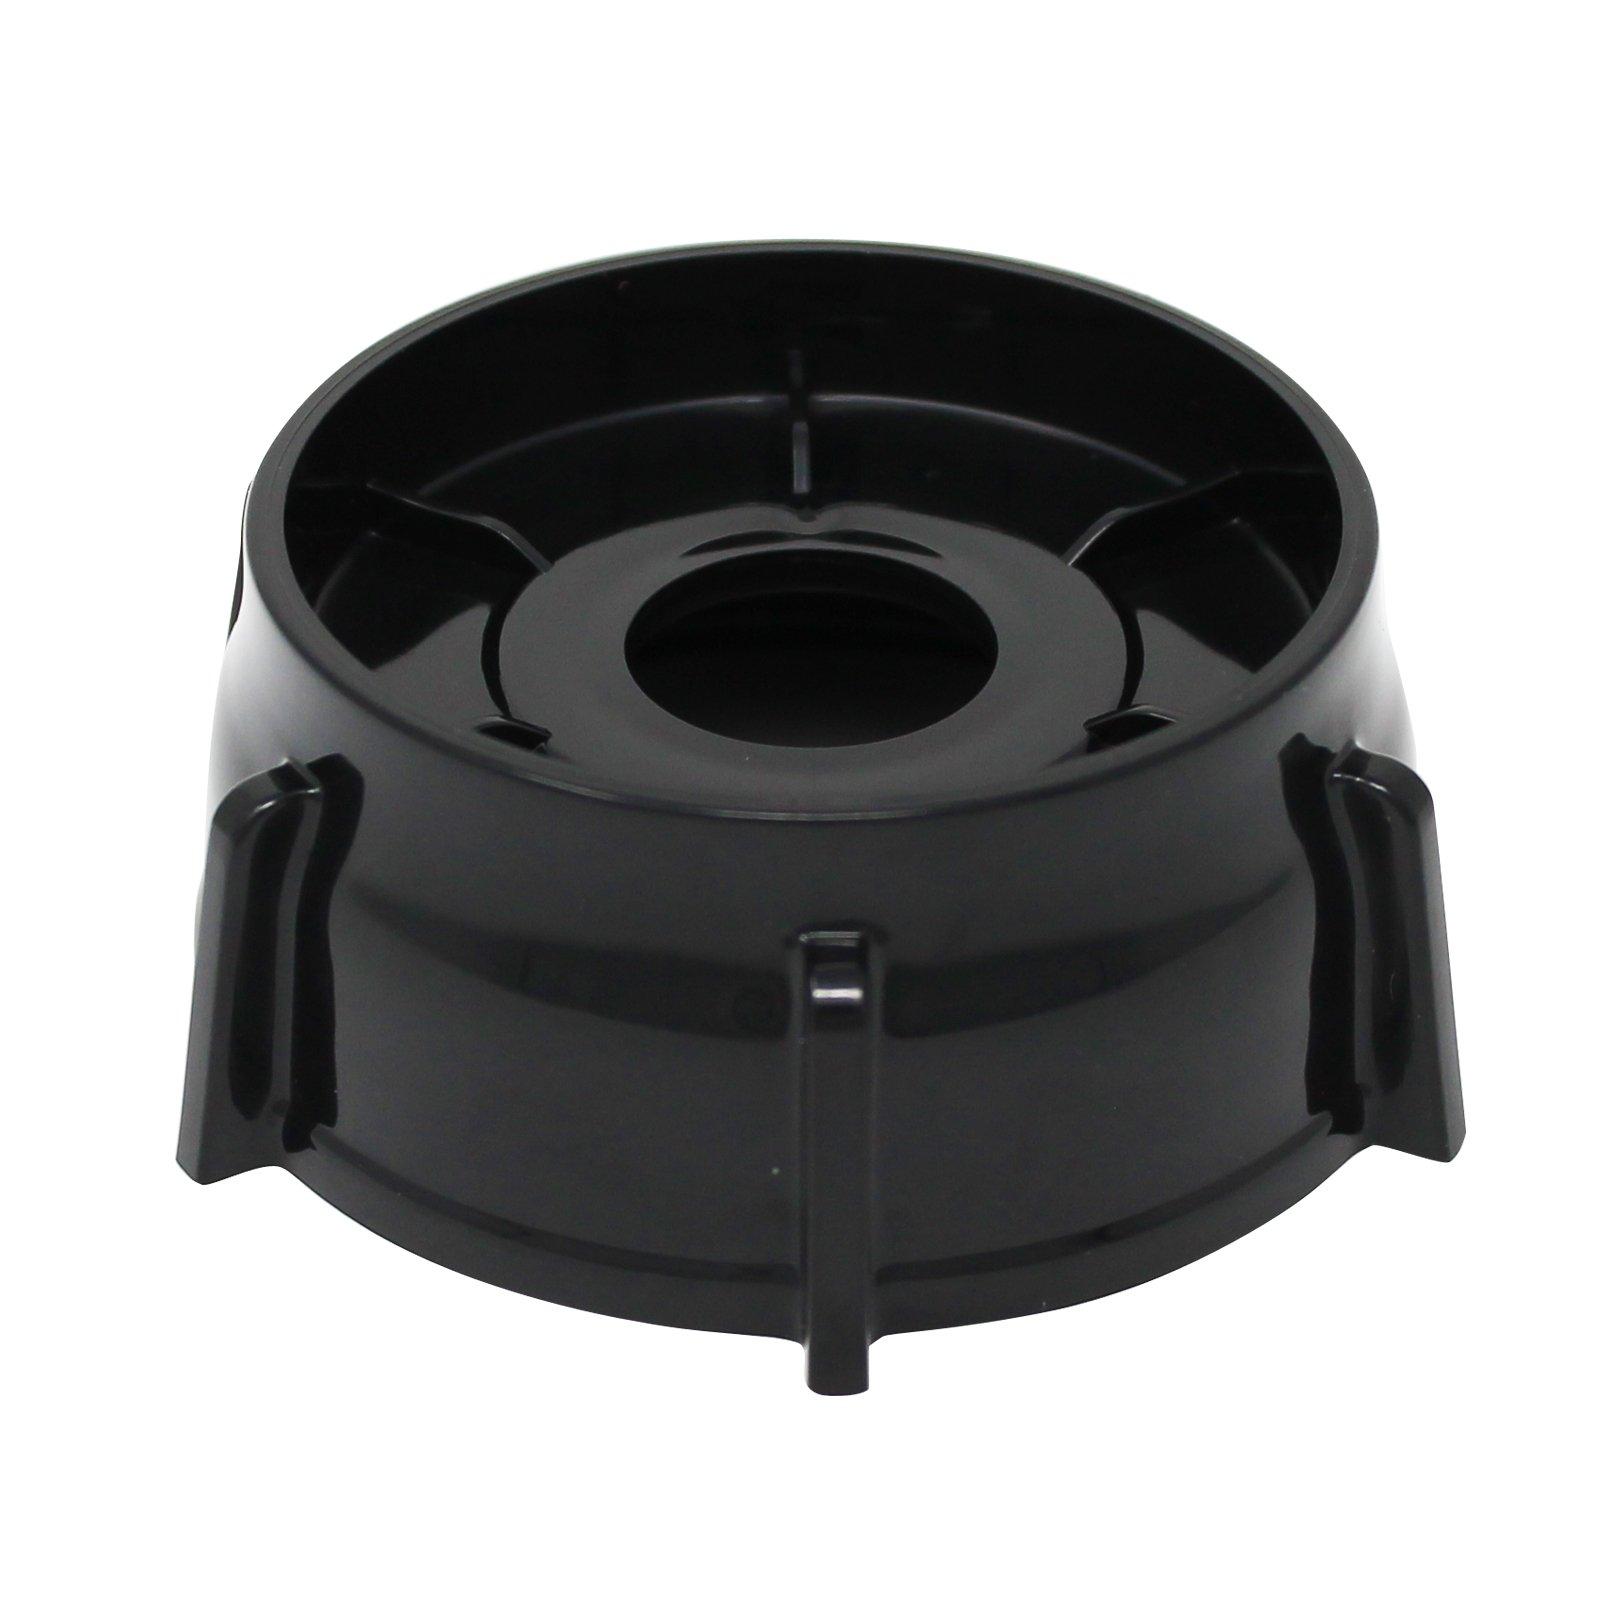 Replacement Oster 148381-000-090 Blender Jar Bottom Cap for Oster 6791-015 12 Speed Blender